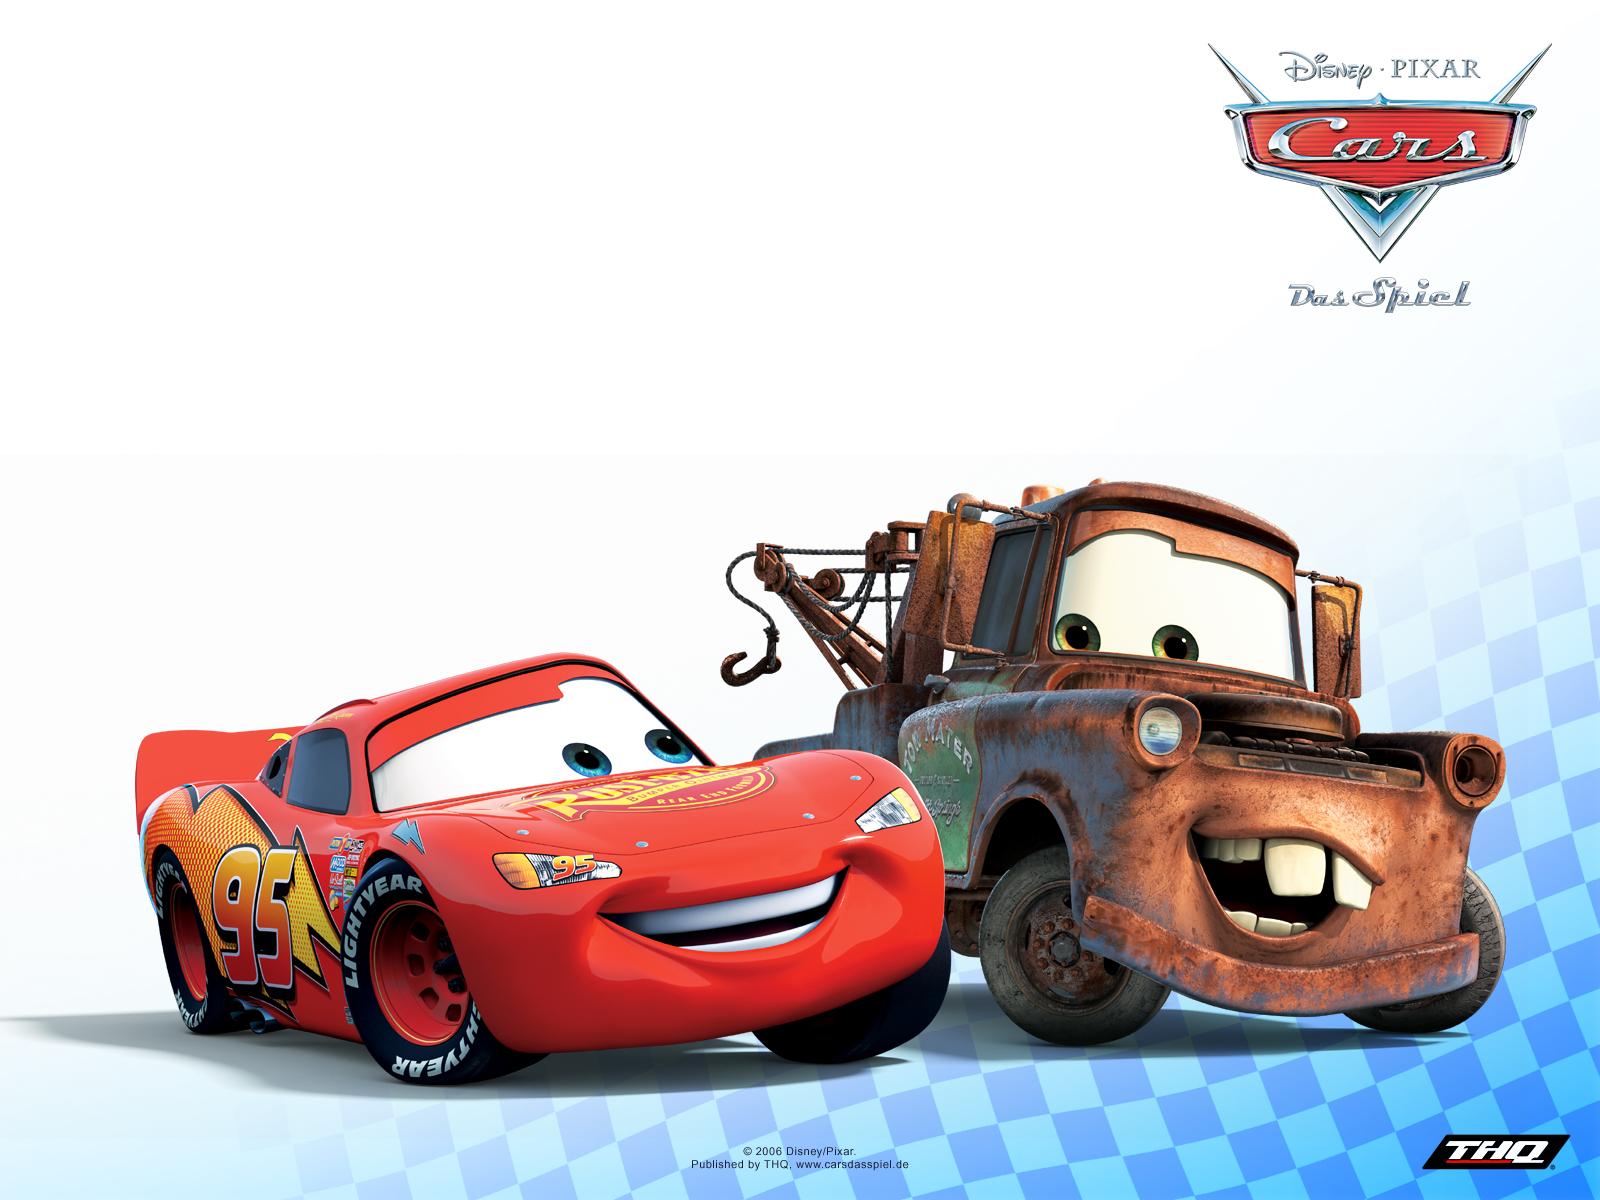 Download cars dsiney pixar hd wallpaper HD wallpaper 1600x1200